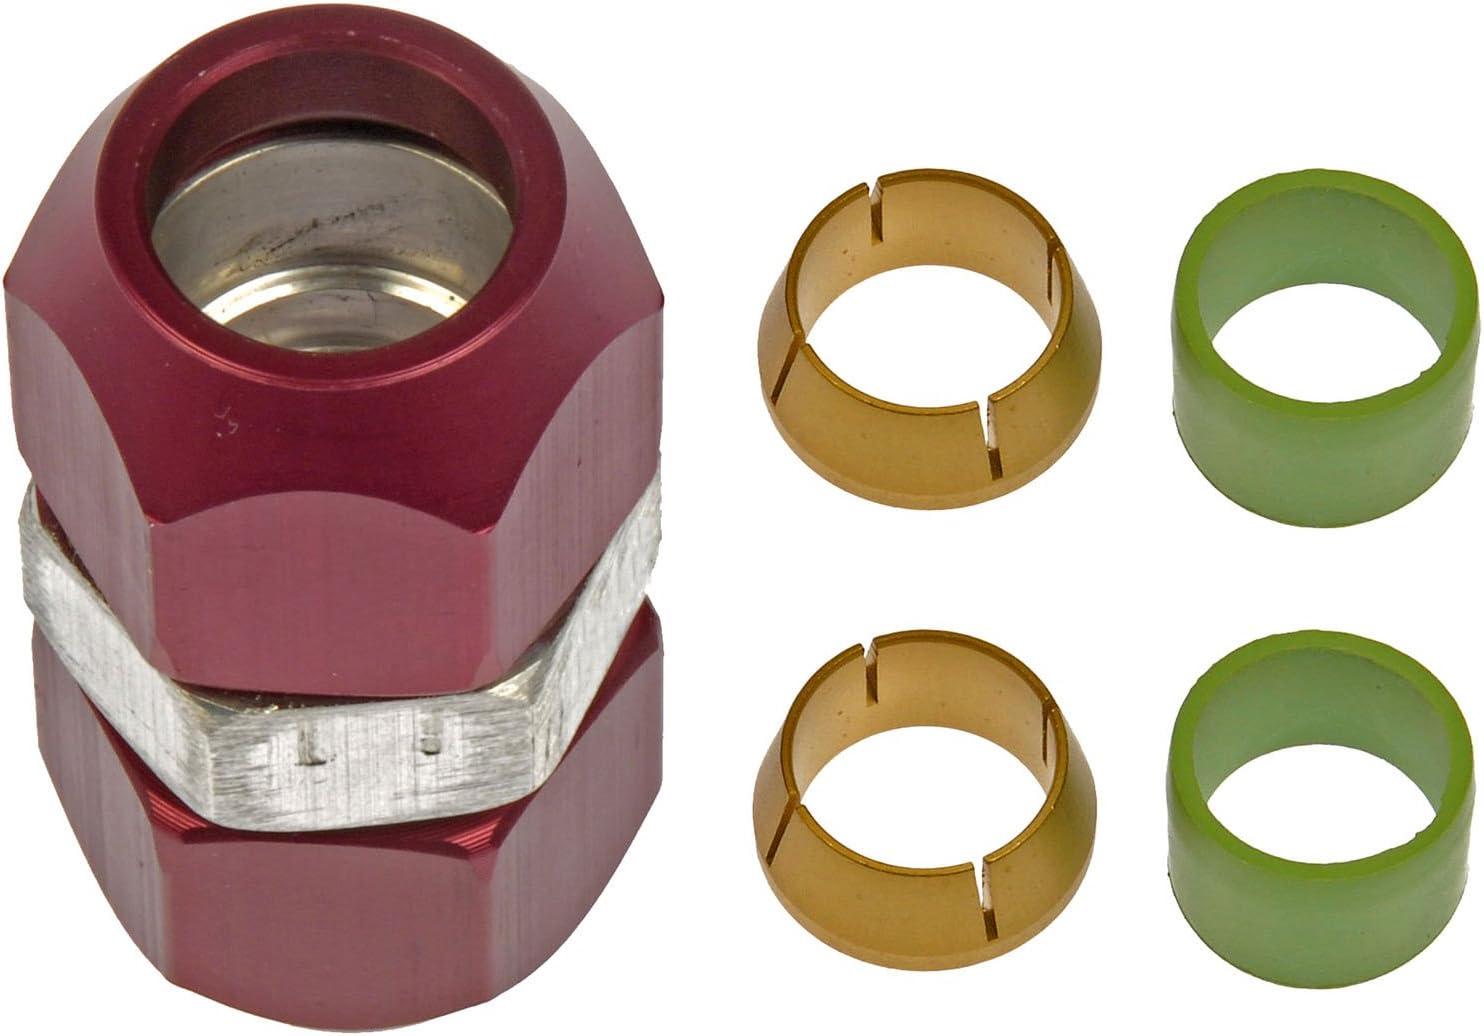 SPLICE-LOK //KLEDGE-LOK A//C Repair Ends O-Ring Assortment